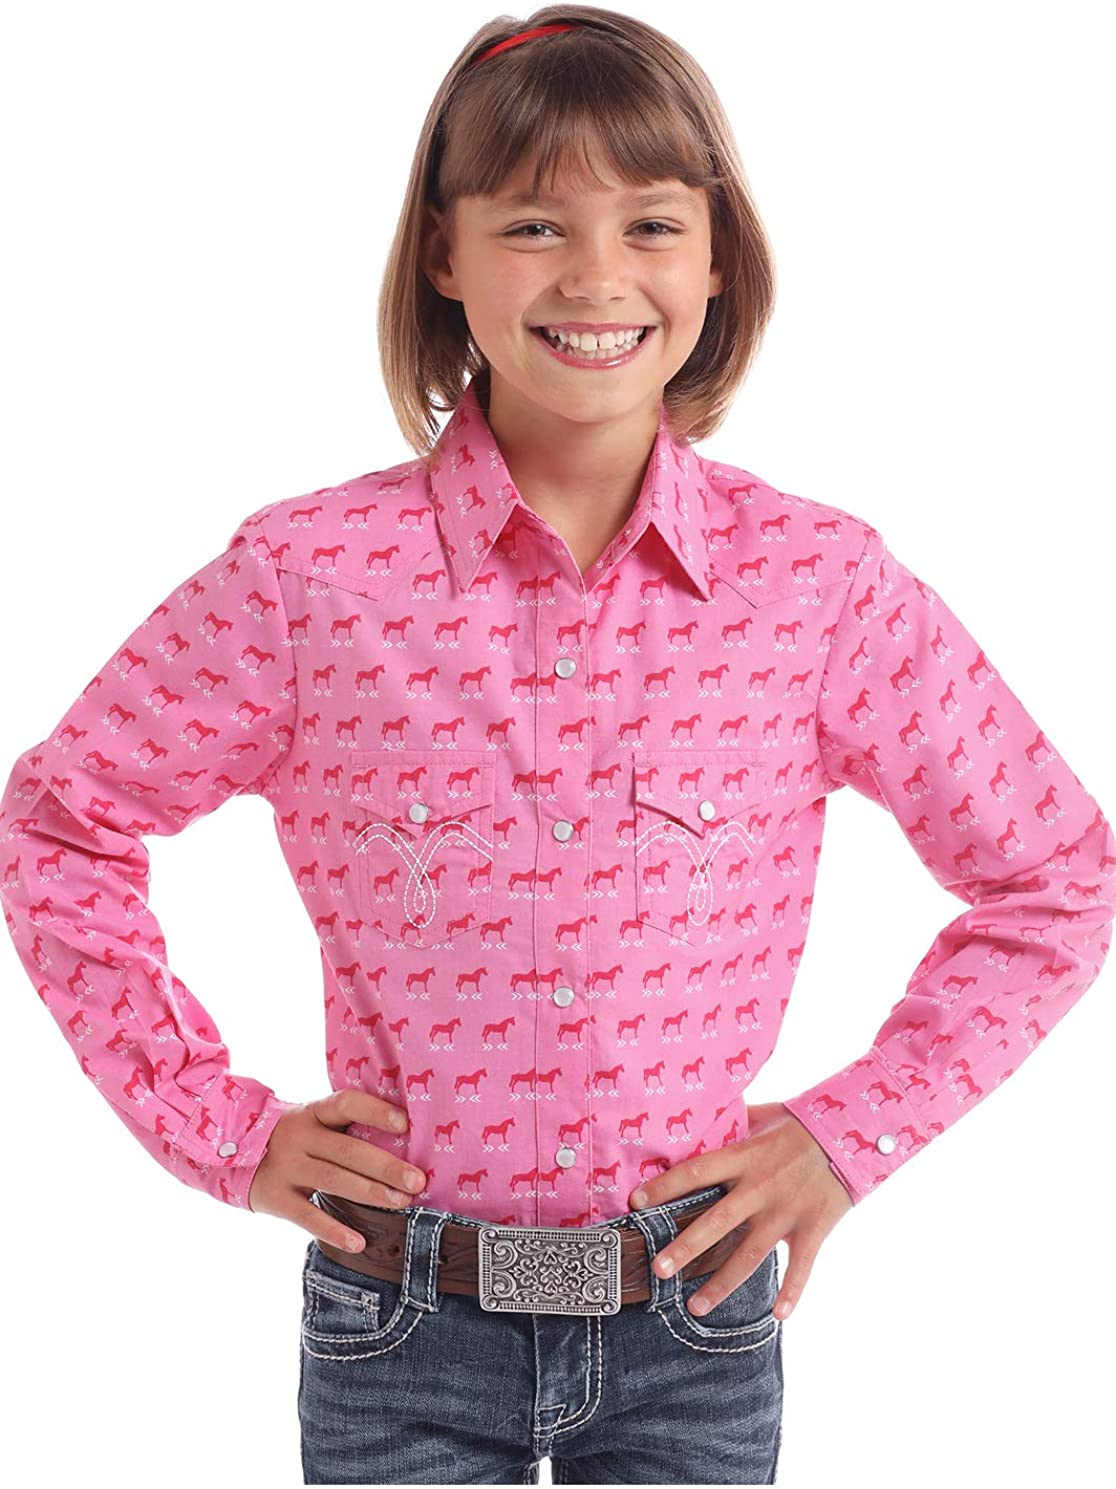 Panhandle White Label Girls Long Sleeve Snap Shirt Horse Print Rose XX-Large